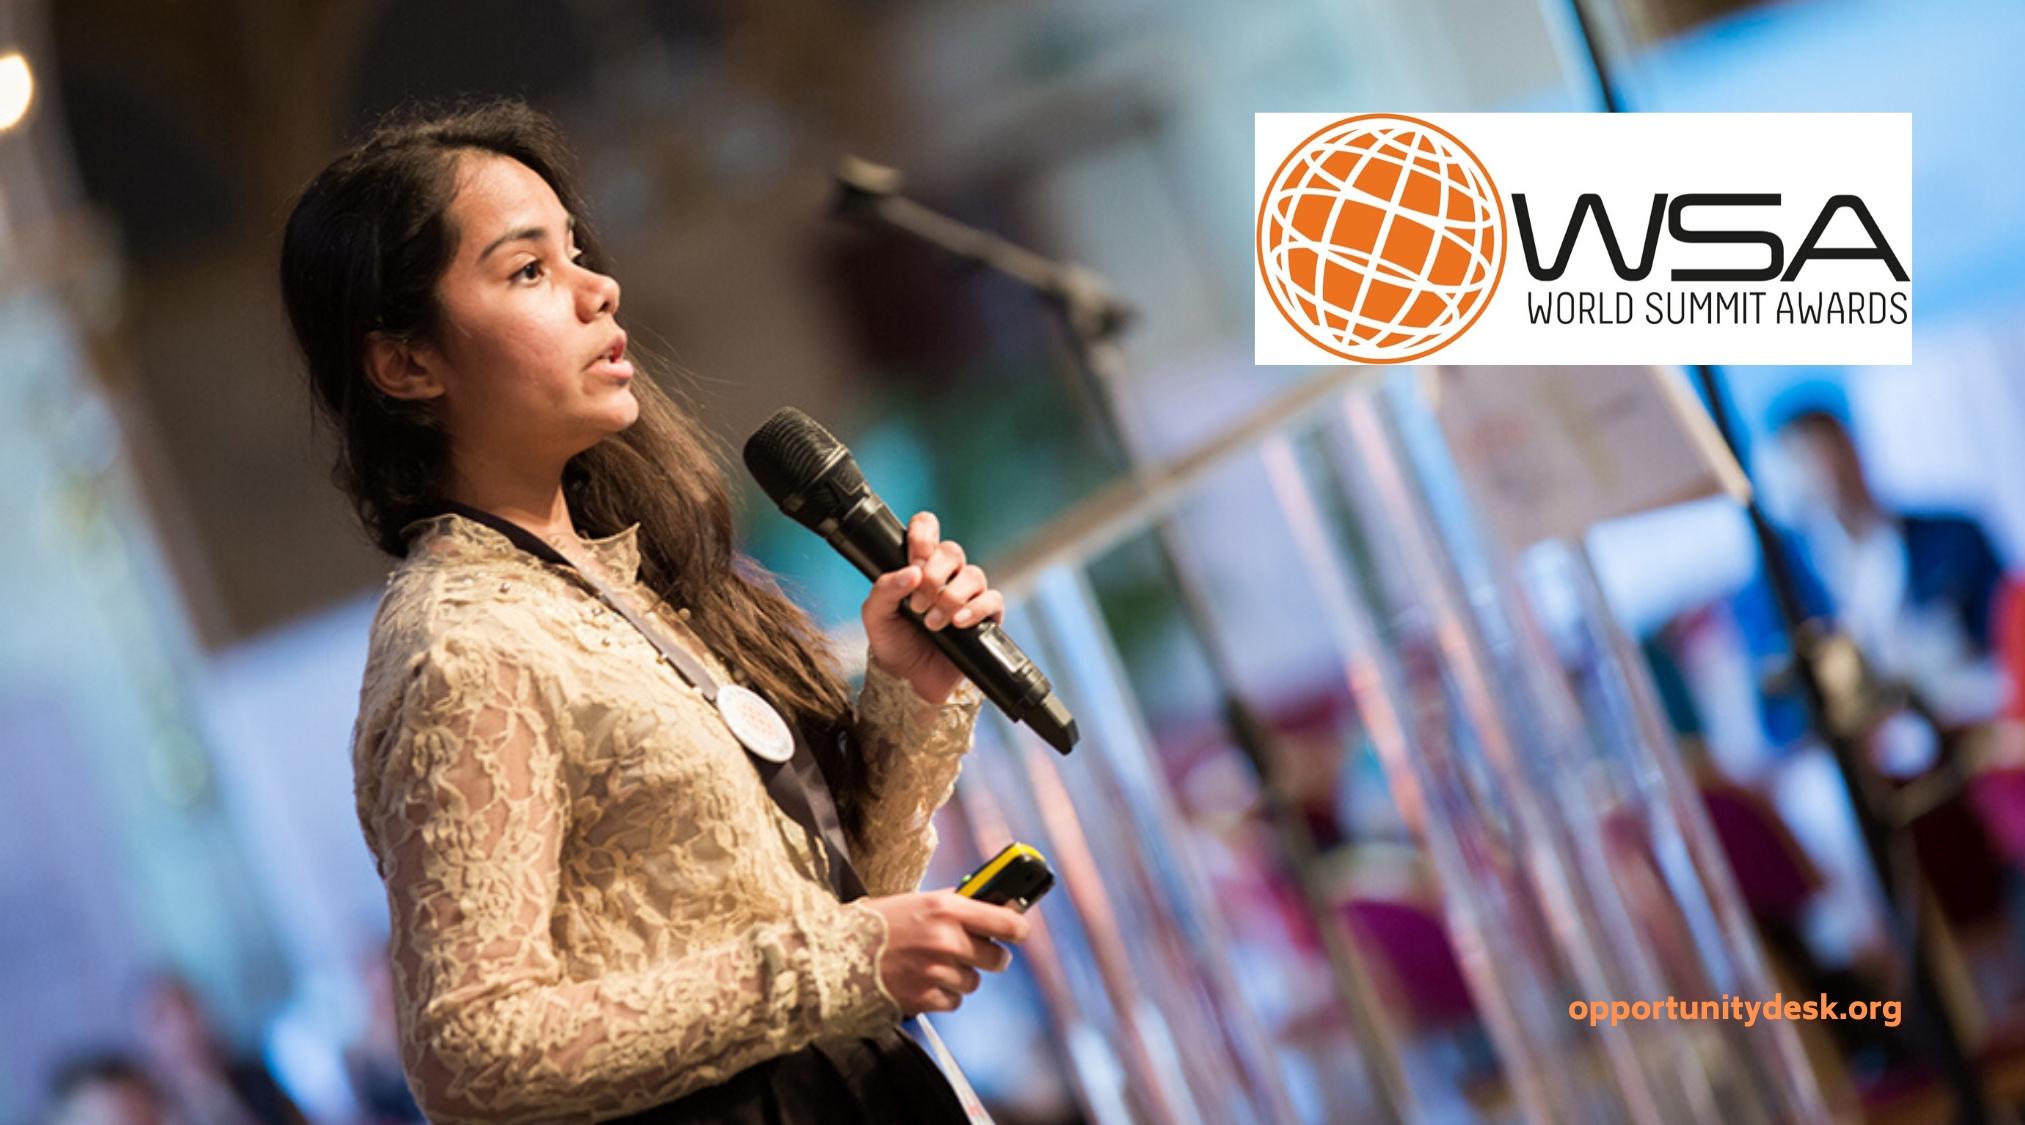 World Summit Awards – WSA Young Innovators 2020 (Win invitation to the WSA Global Congress)